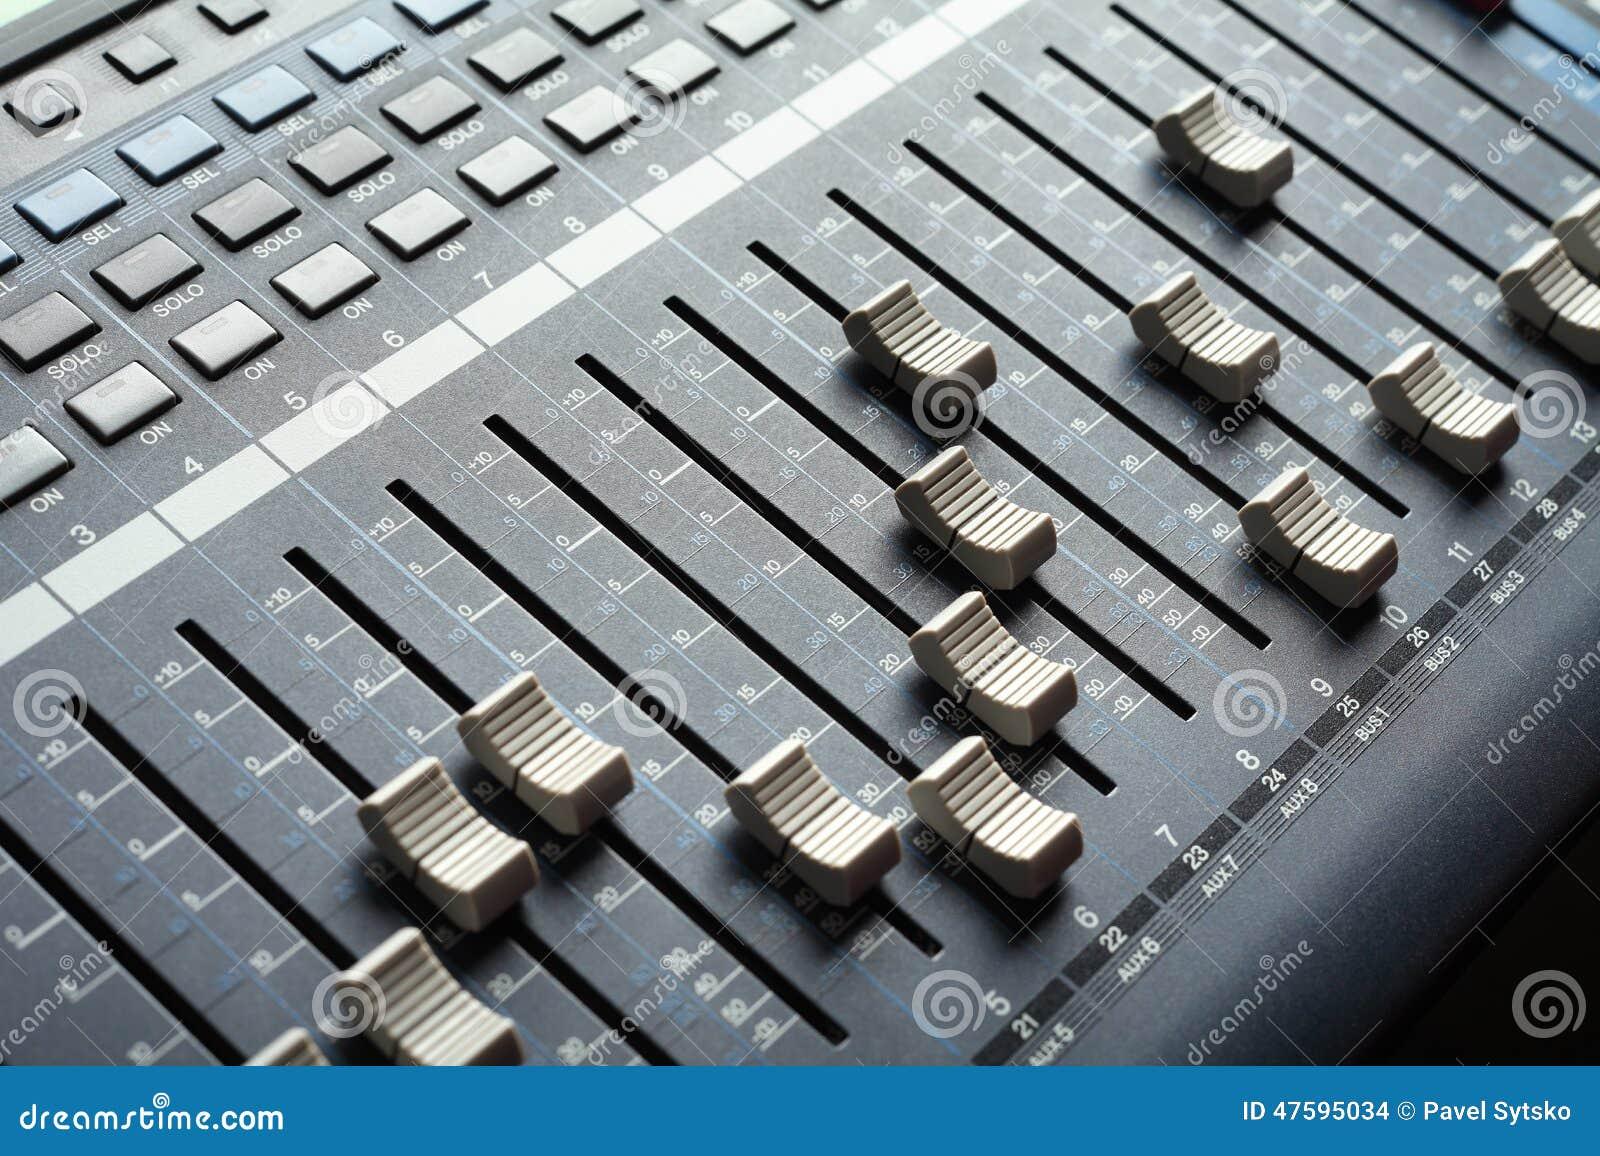 professional audio mixing console recording studio equipment stock photo image 47595034. Black Bedroom Furniture Sets. Home Design Ideas